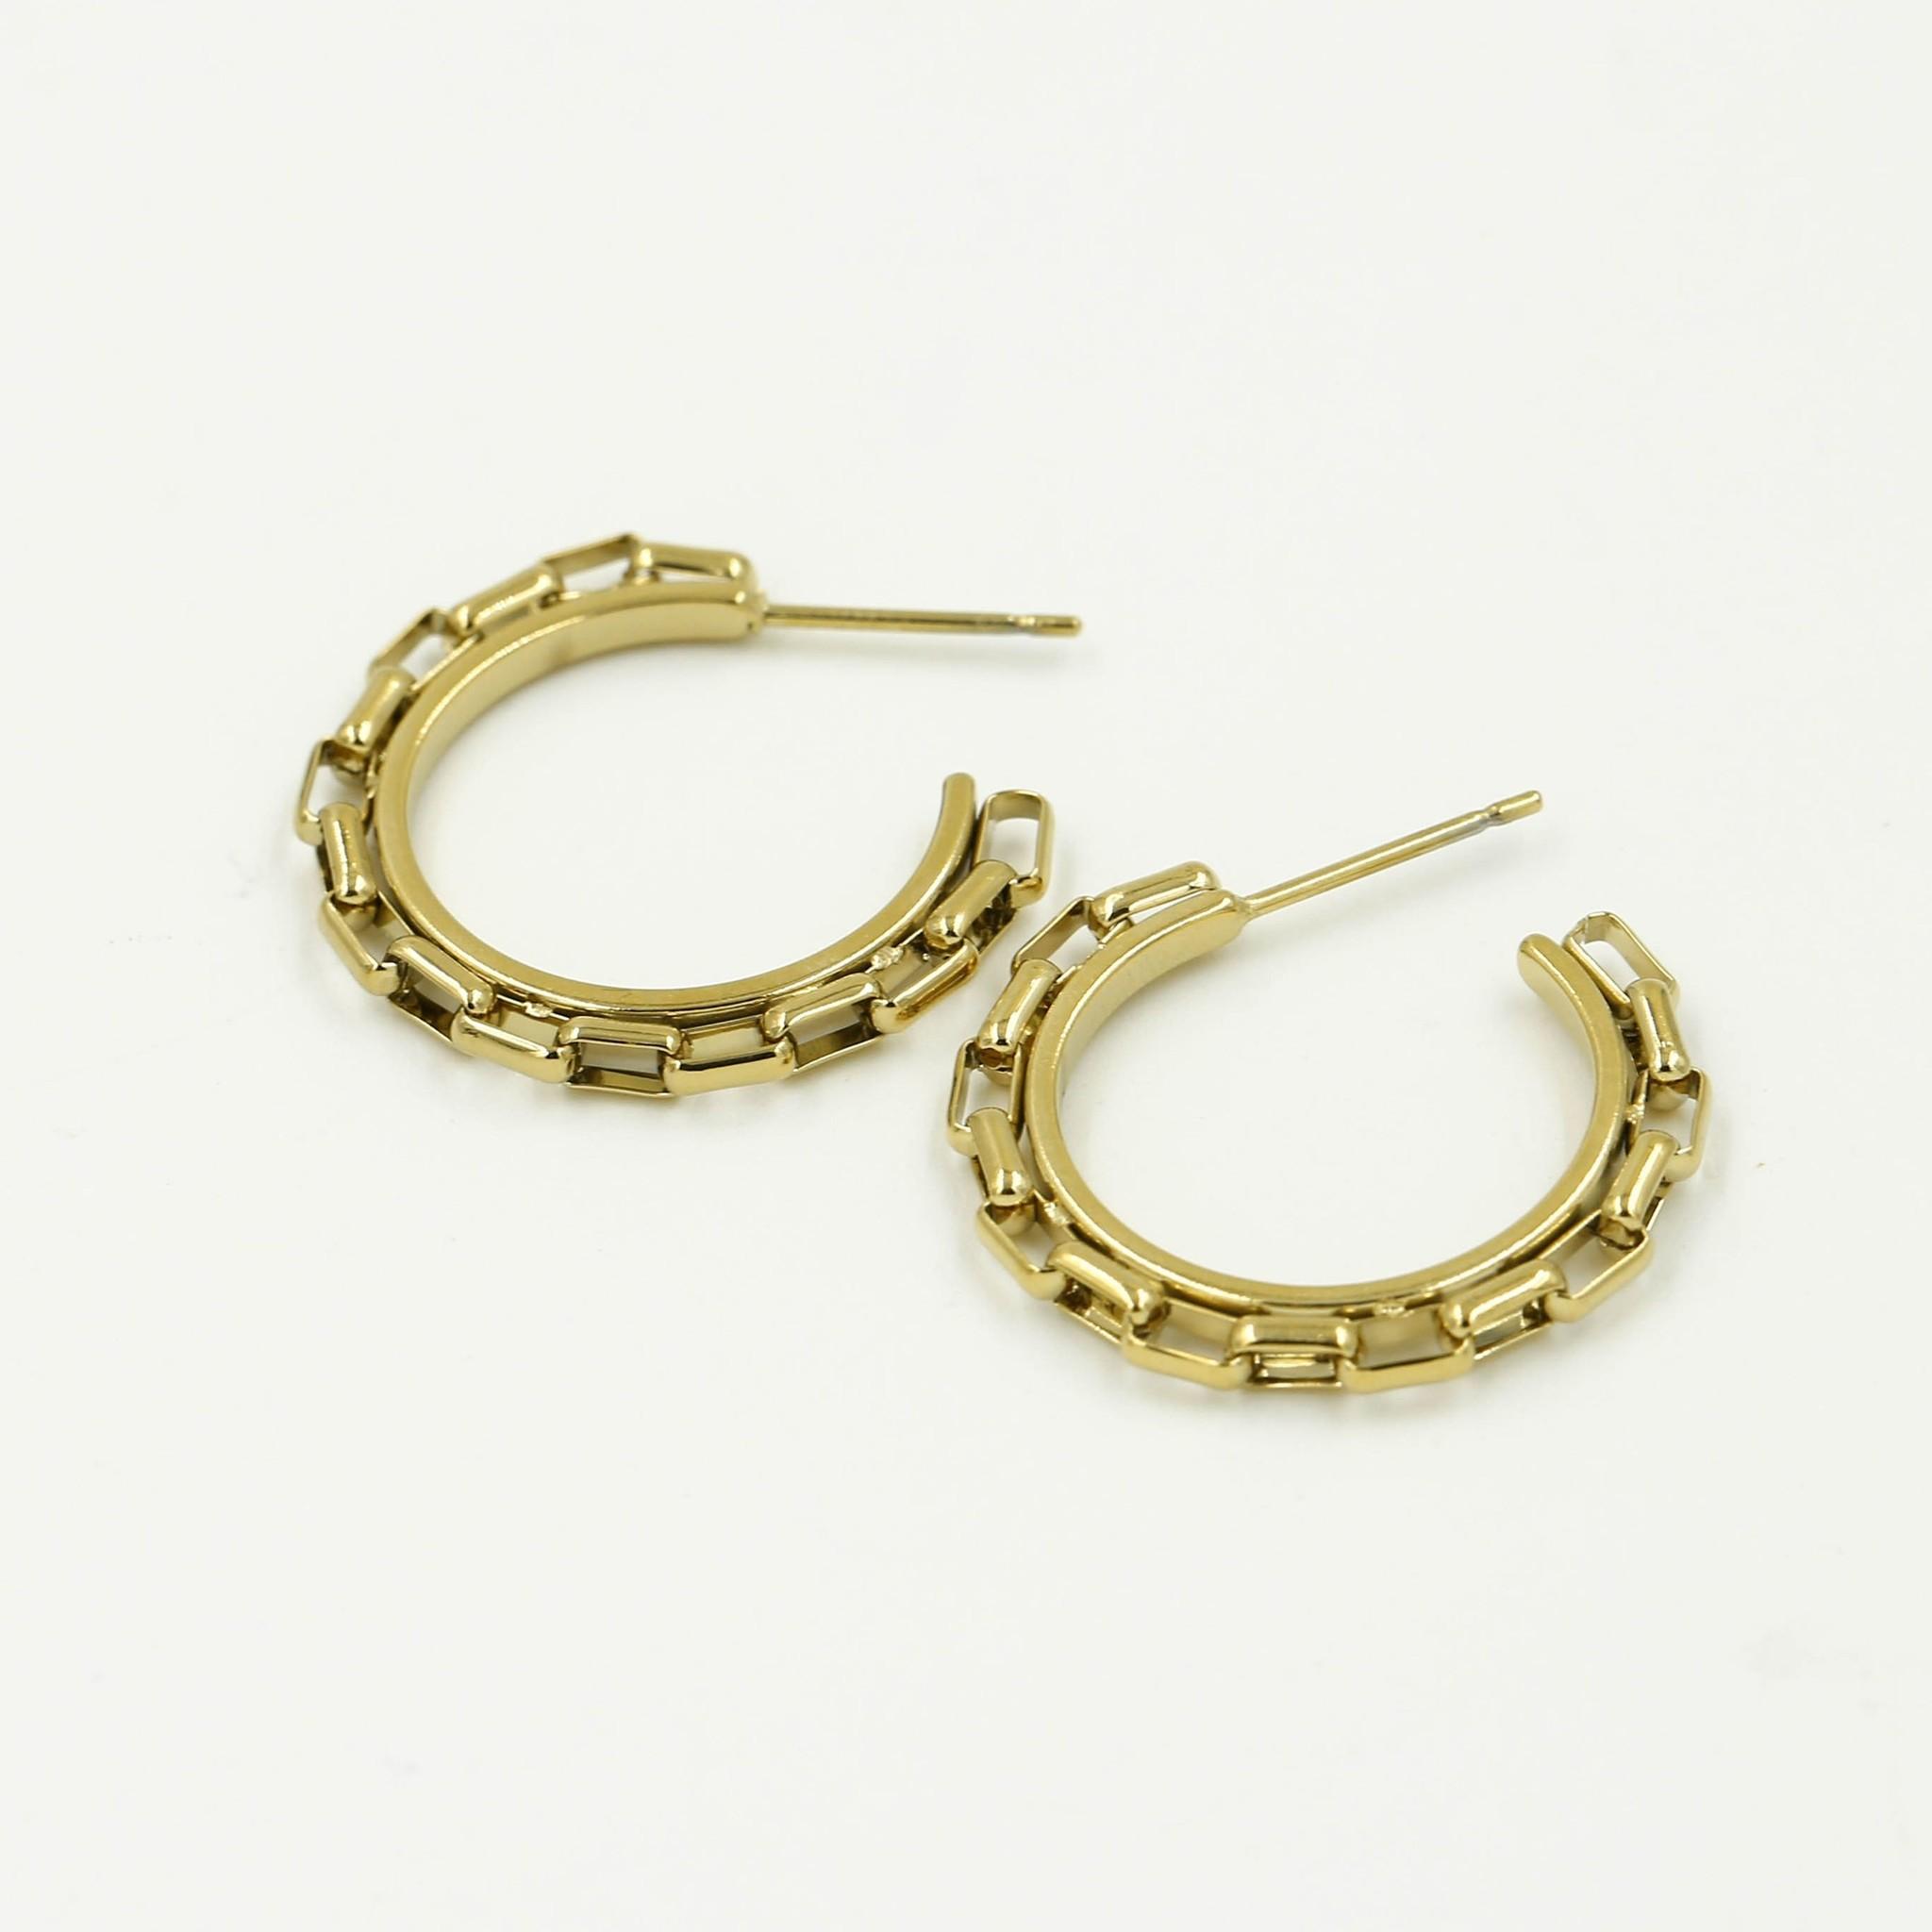 Gold Hoop Earrings Chunky Chain Links